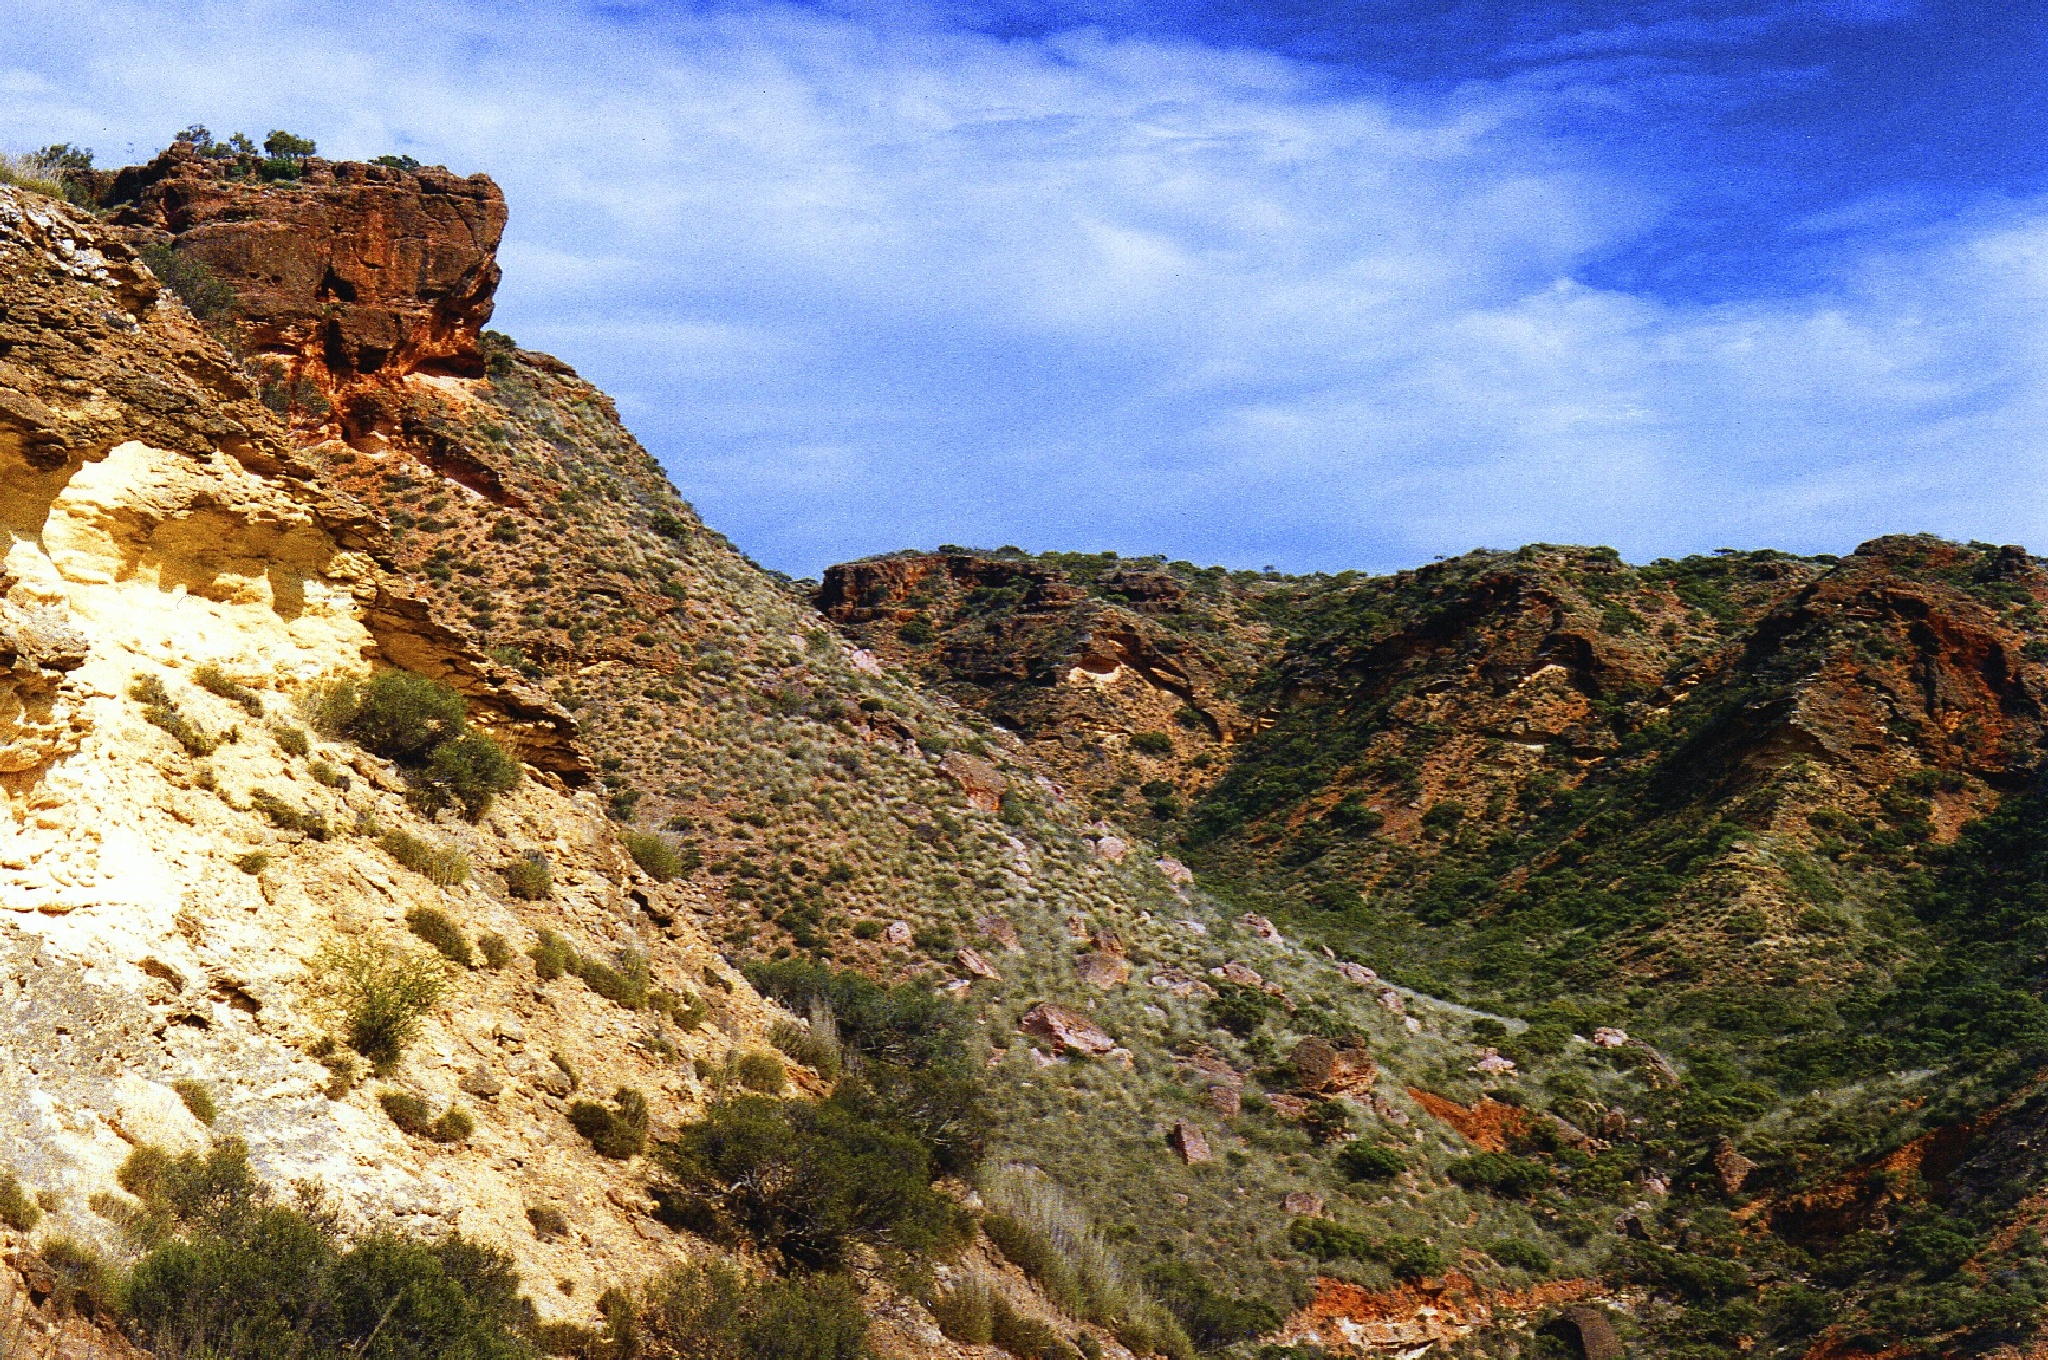 Cape Range national park. by Rovert